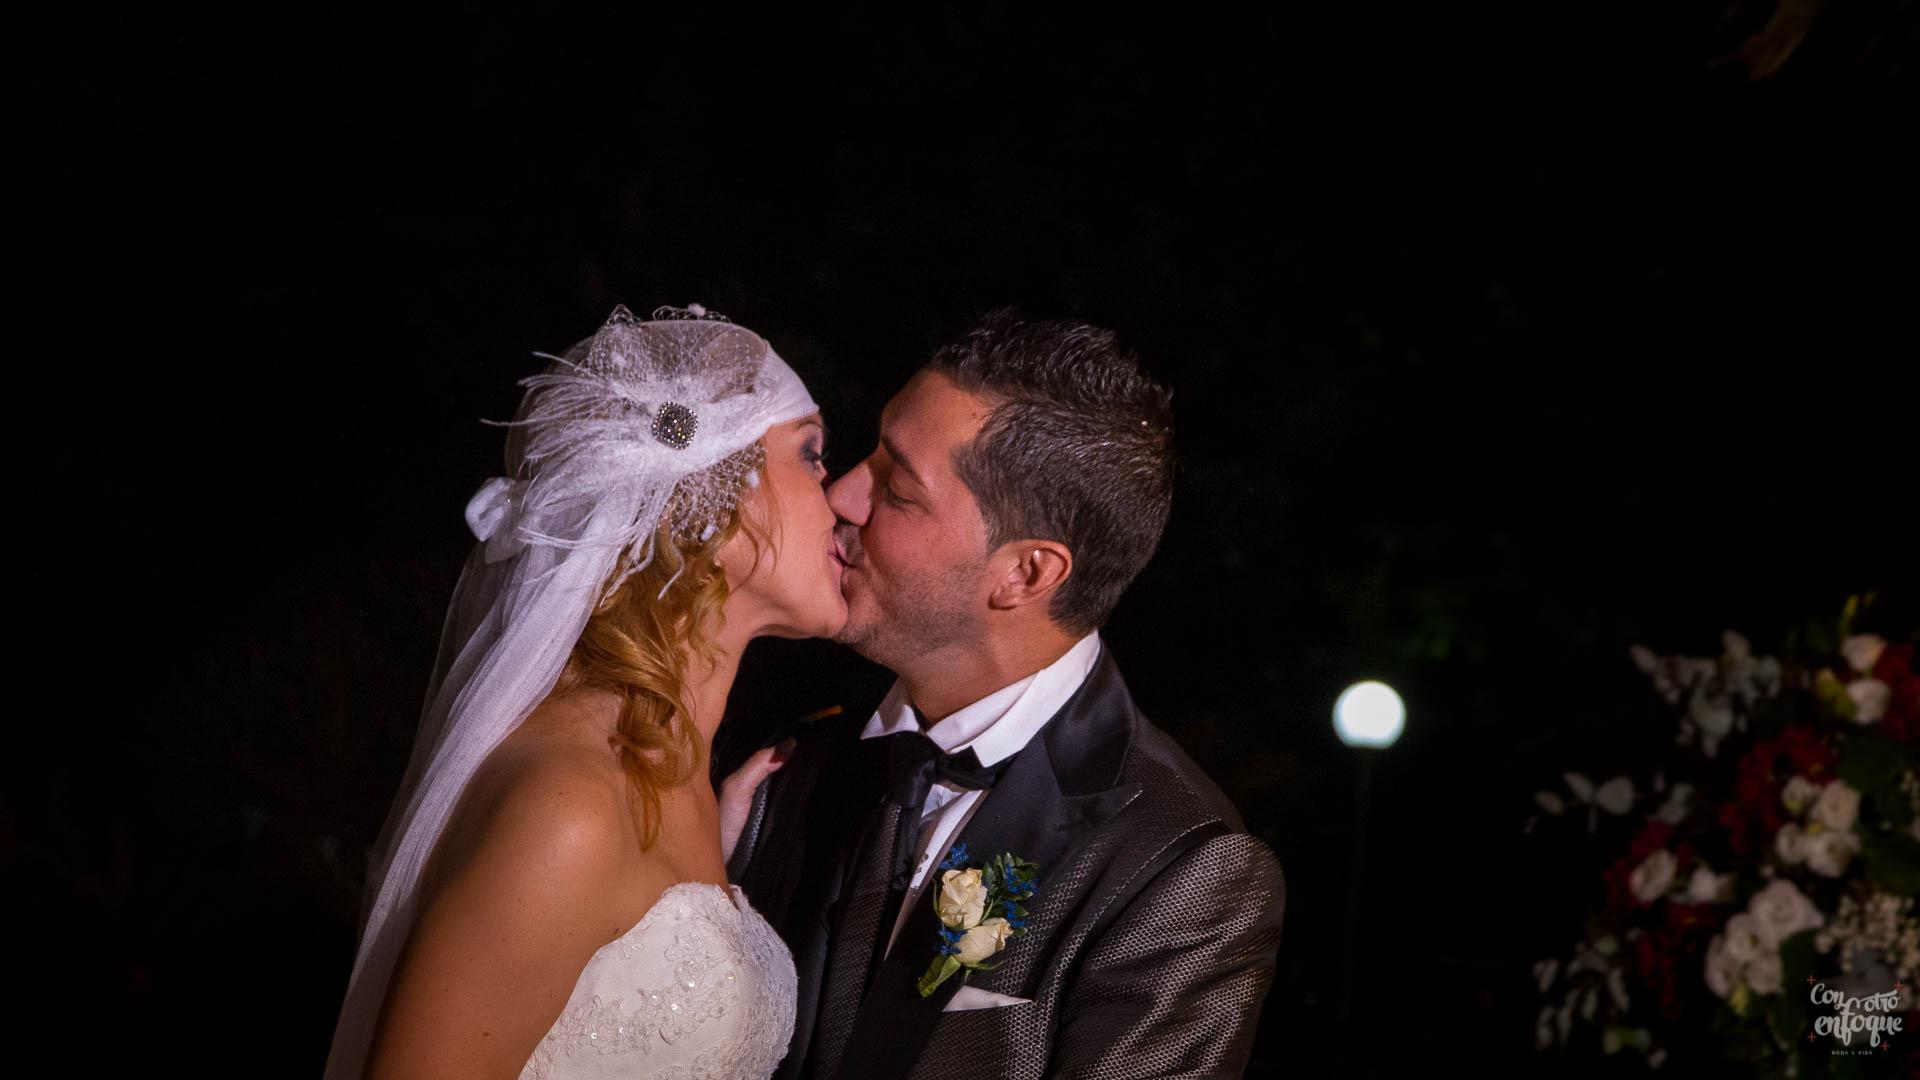 slow wedding tu Boda en La Hípica Valencia wedding Spain love bridal-bride-fotógrafos de bodas en Valencia -boda aire libre